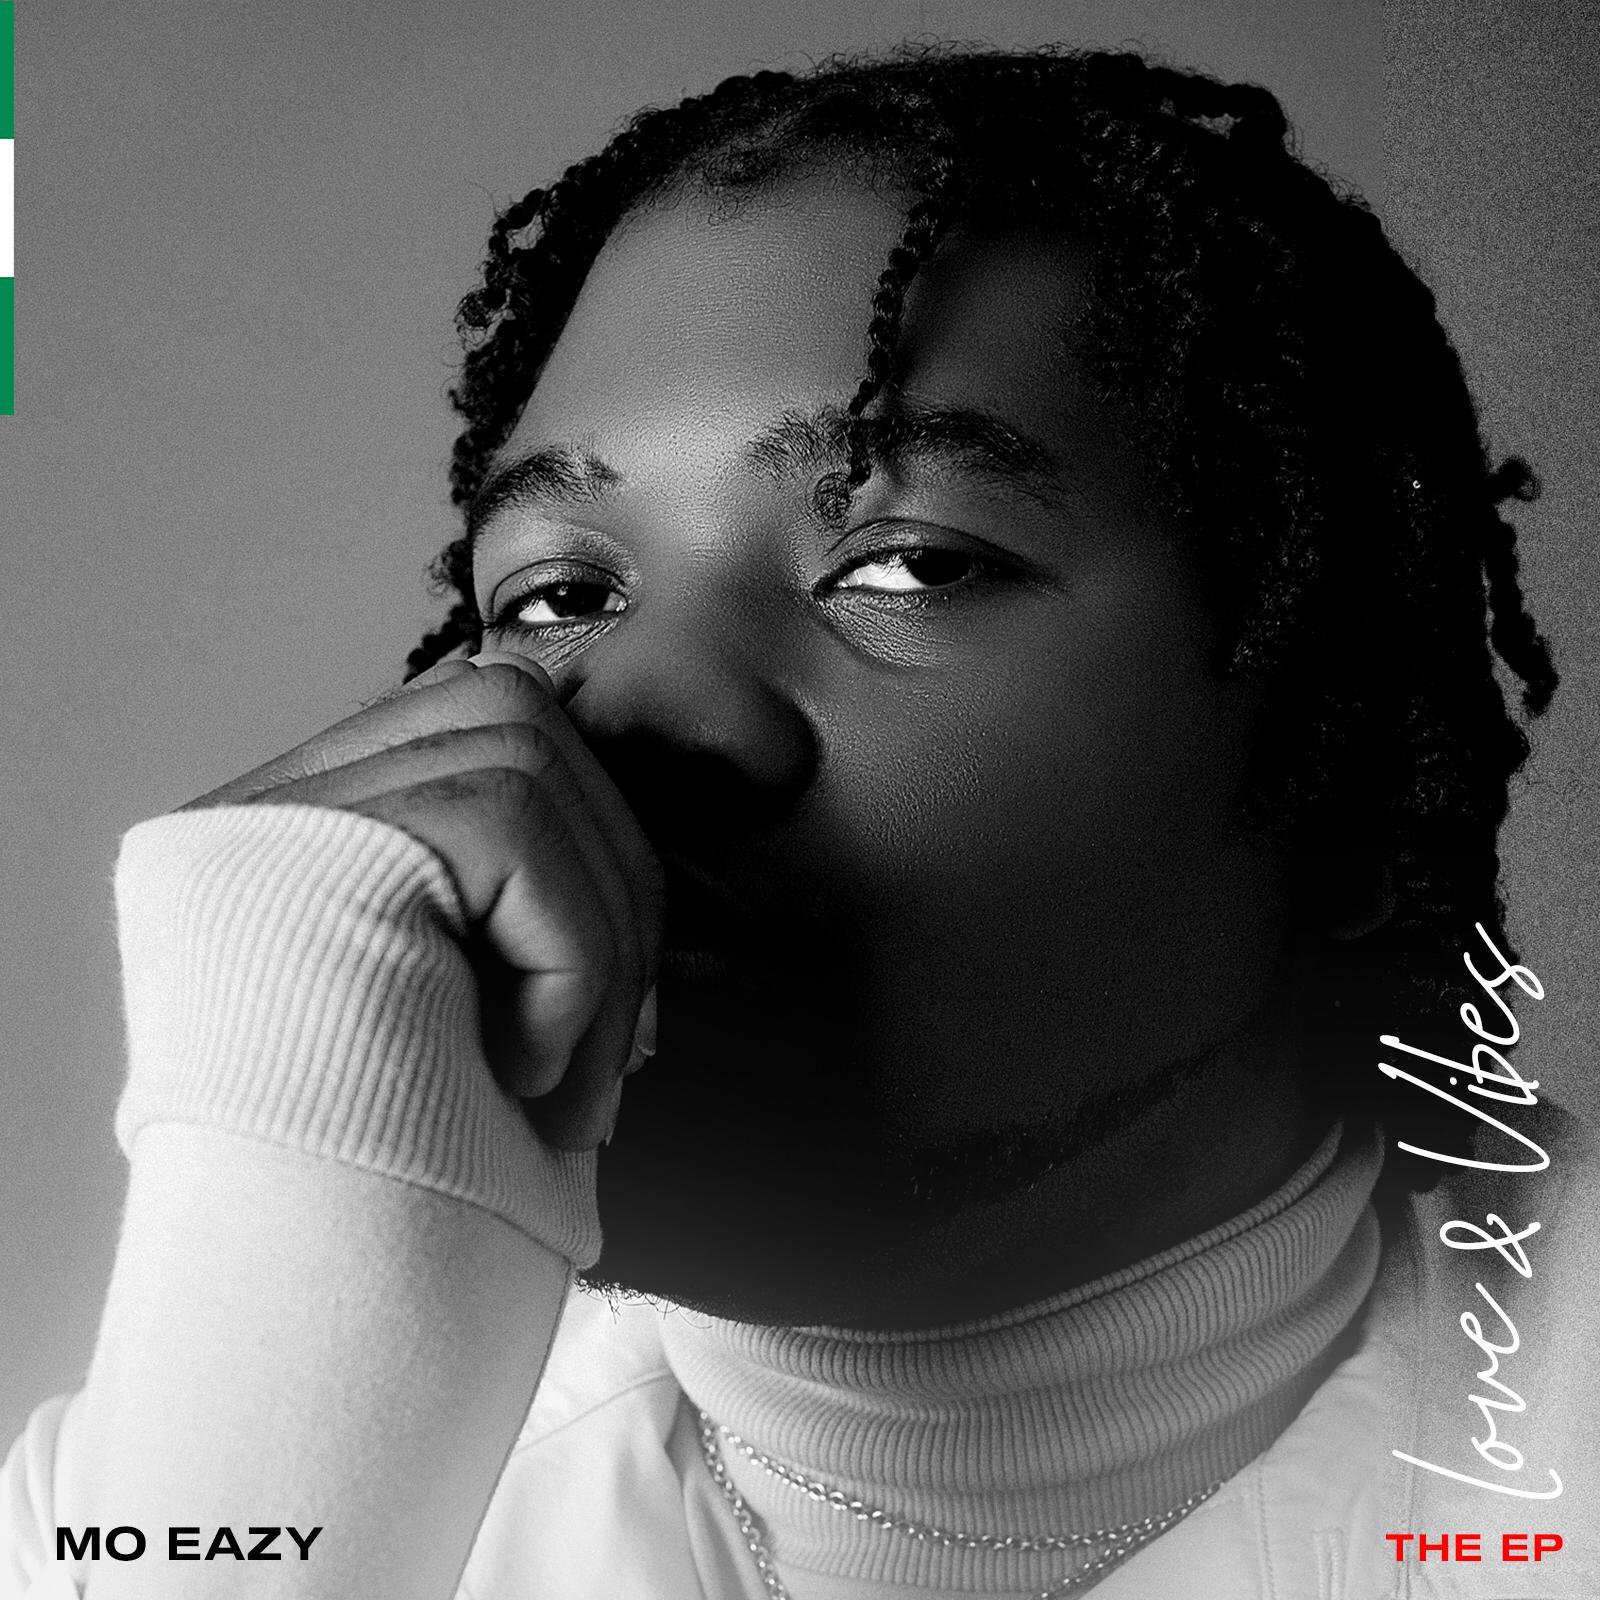 Mo Eazy – Love & Vibes EP